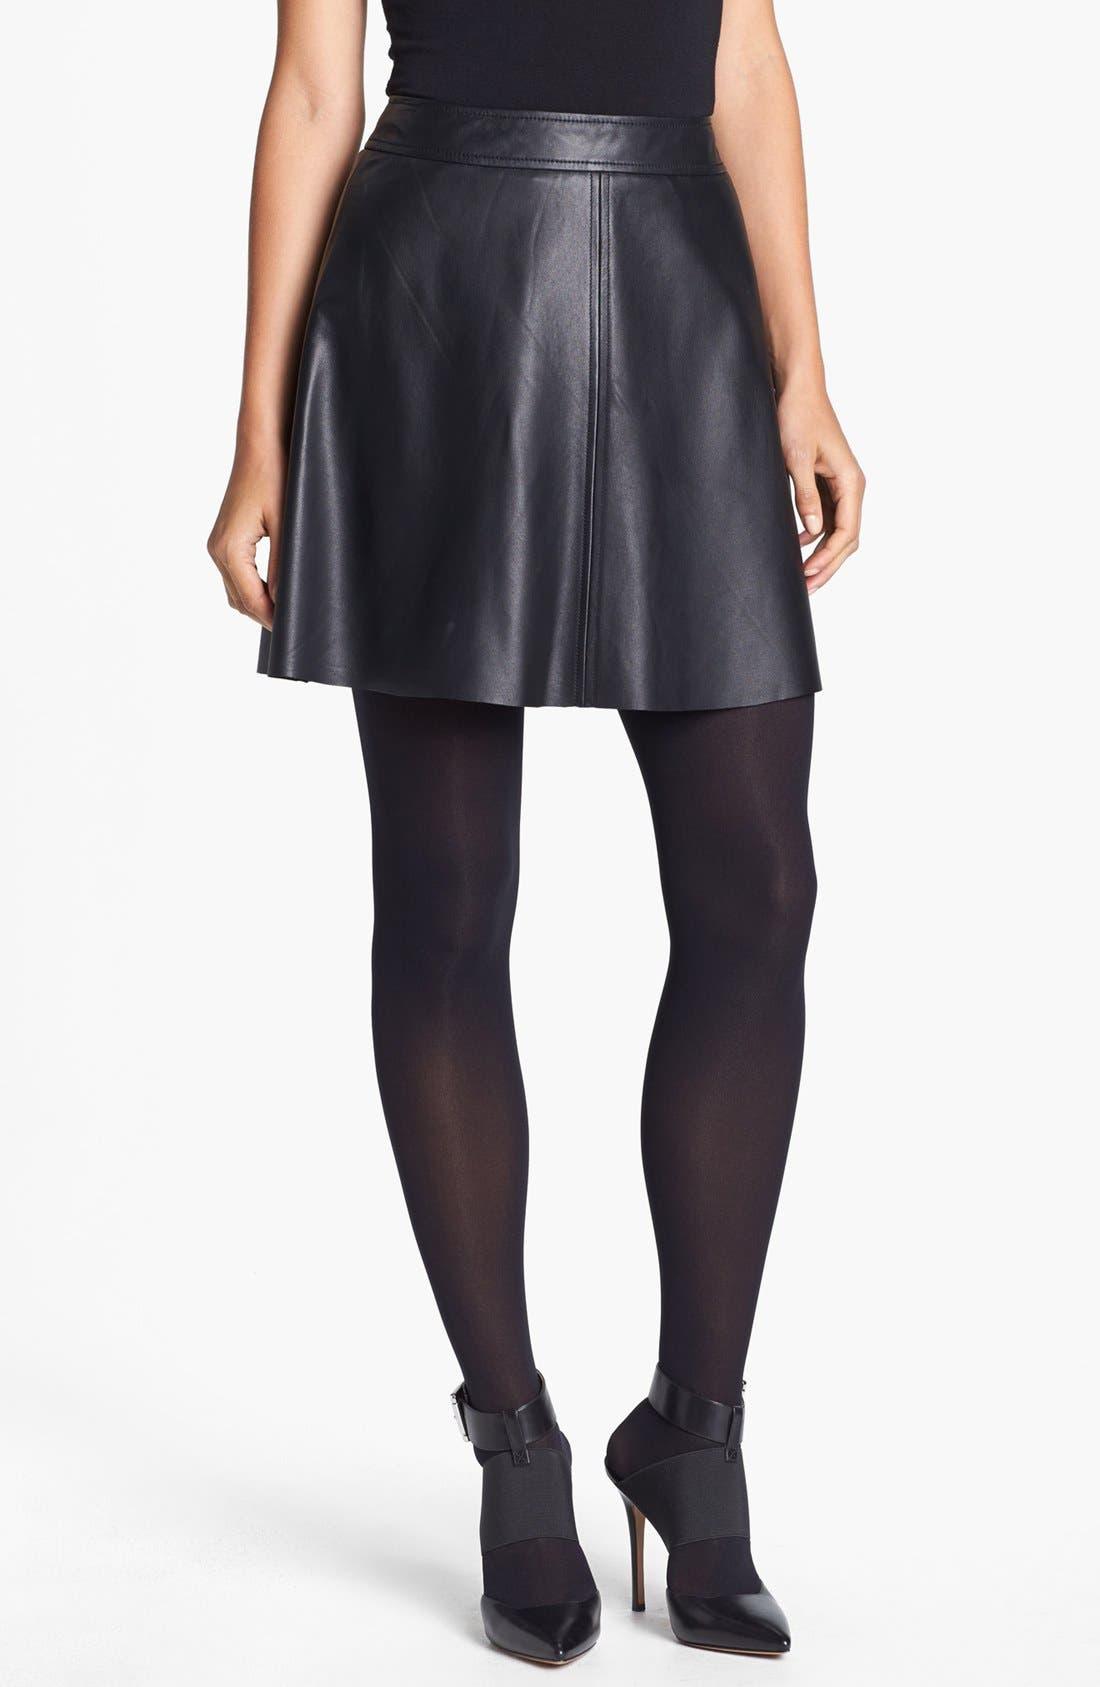 Main Image - Trina Turk 'Lanni' Leather Flare Skirt